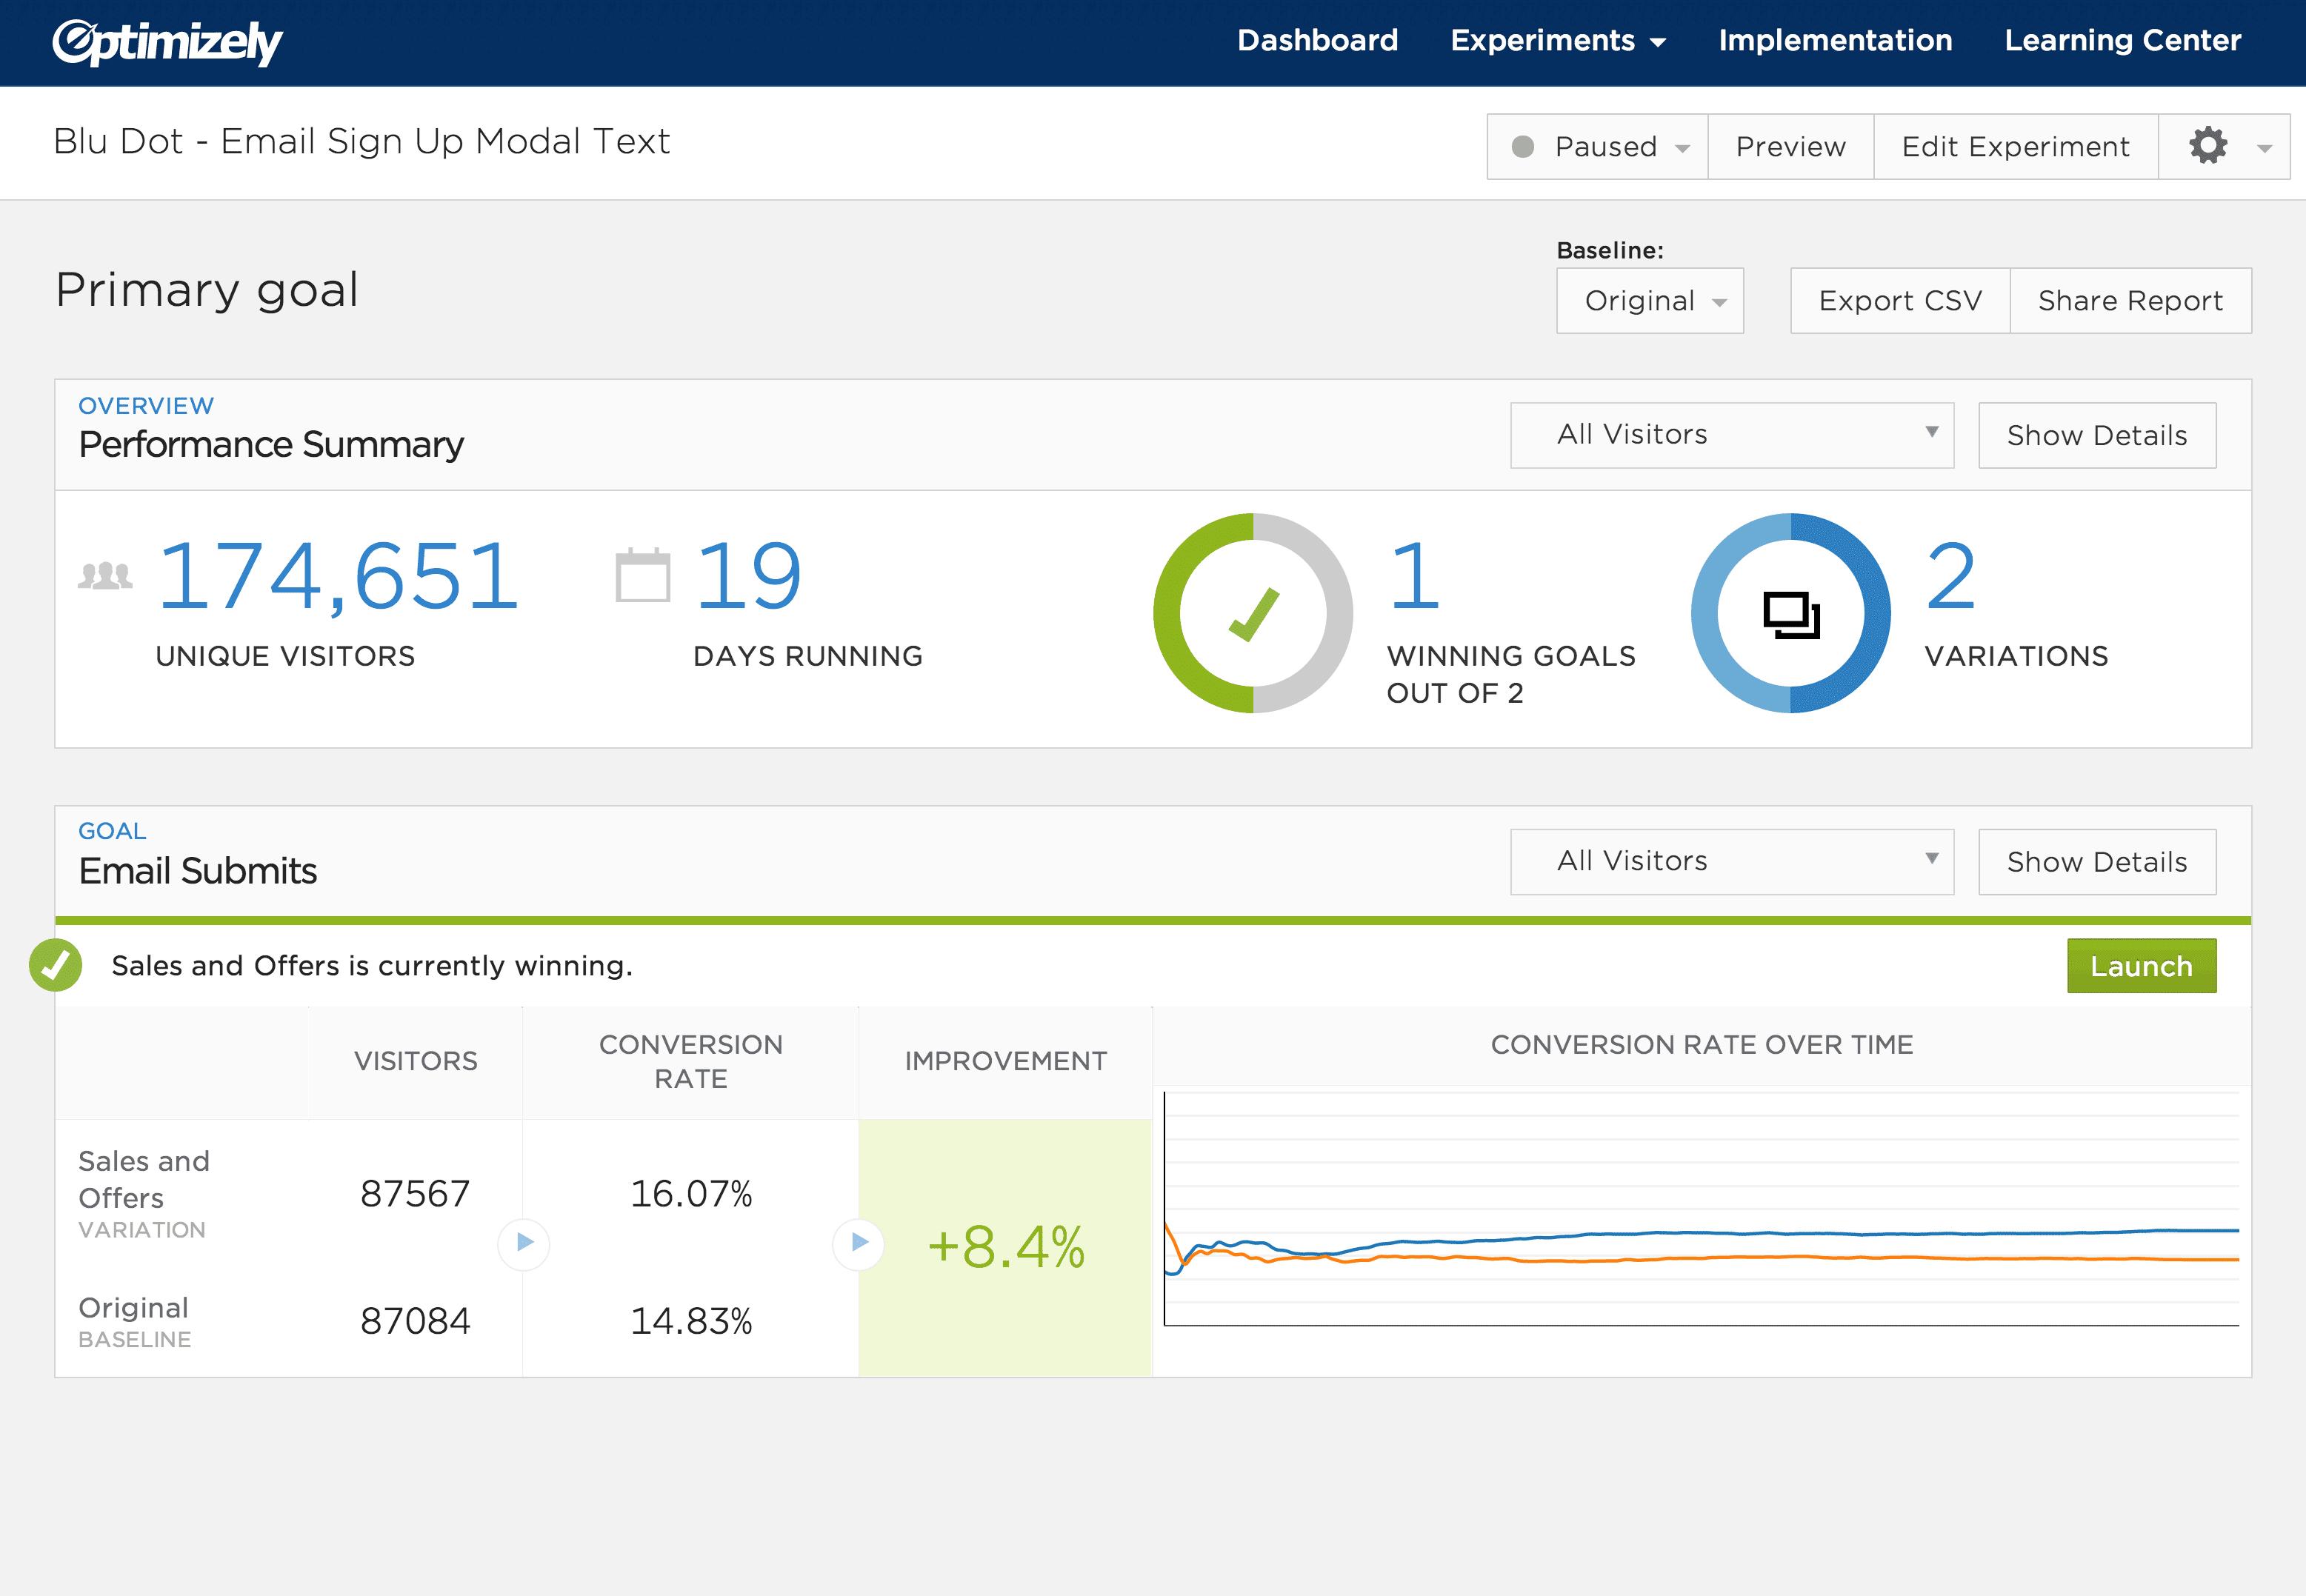 Optimizely web interface